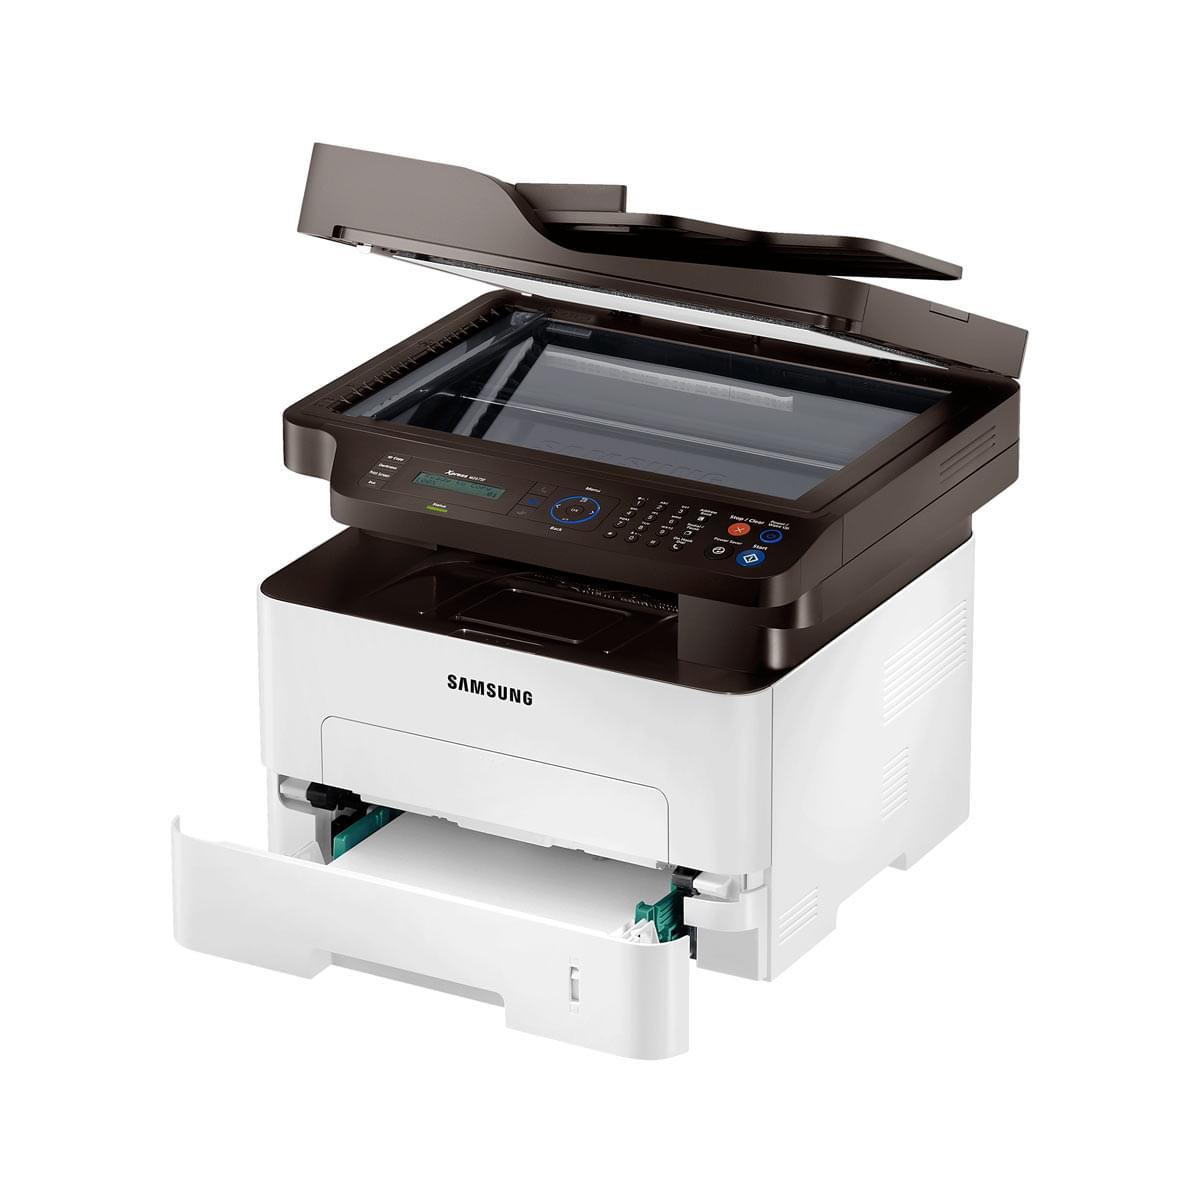 Samsung SL-M2675FN (Laser Mono./Fax/Reseau) (SL-M2675FN/SEE) - Achat / Vente Imprimante Multifonction sur Cybertek.fr - 2